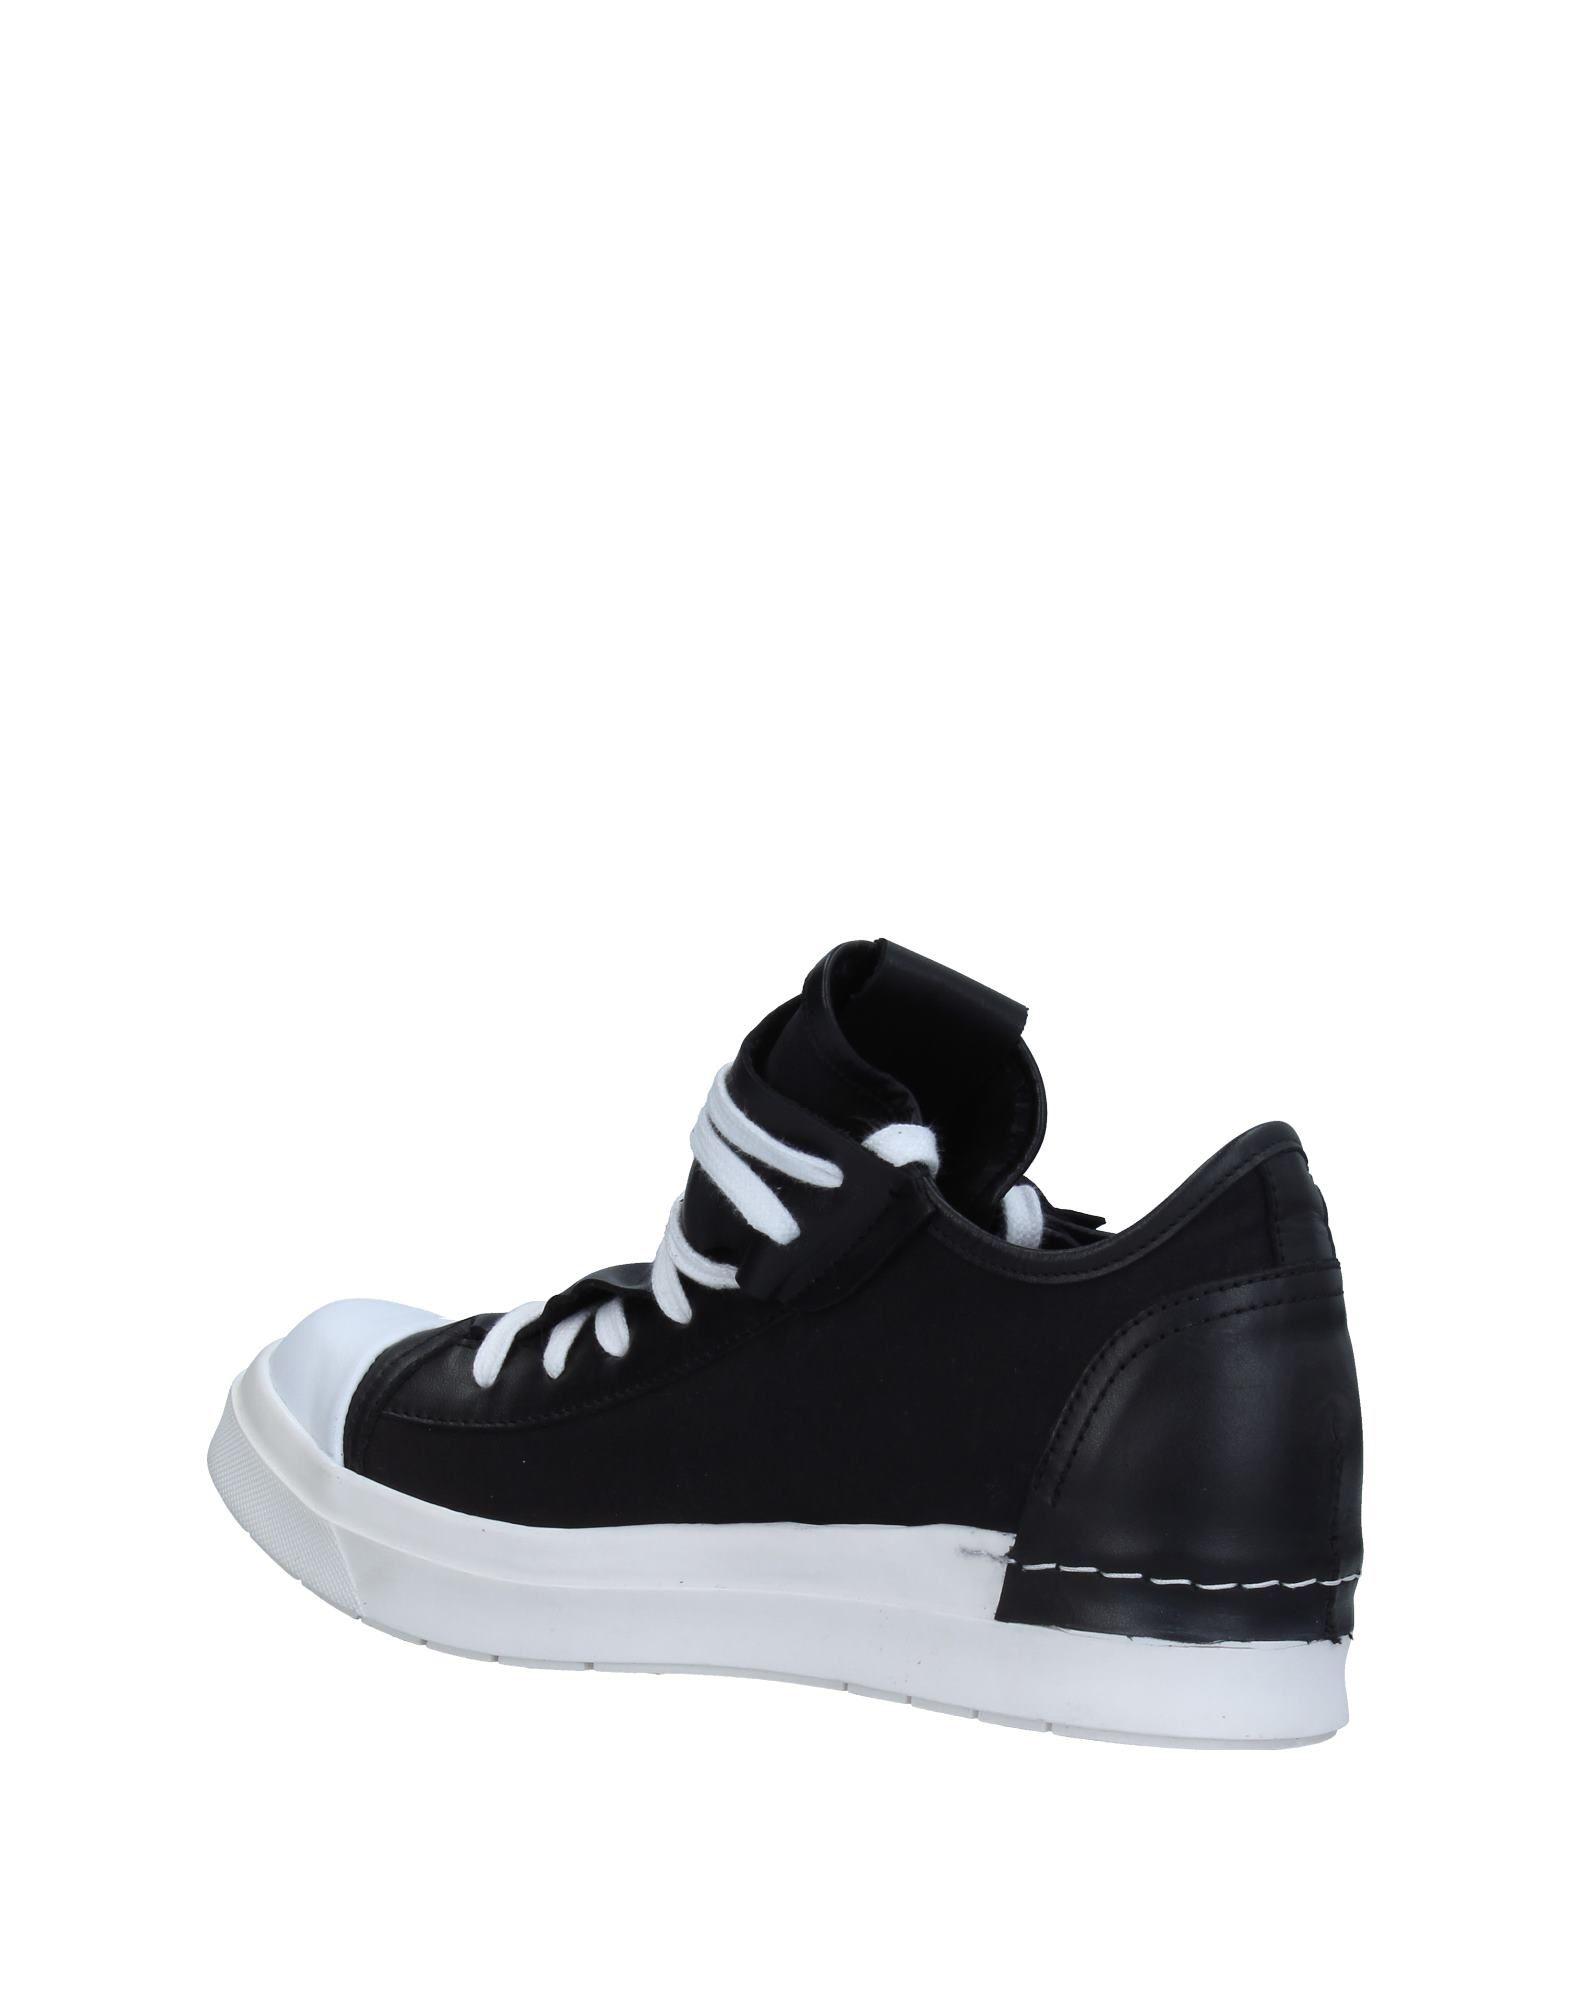 Cinzia Araia Sneakers - Men Cinzia Araia Sneakers Sneakers Sneakers online on  Australia - 11327605GW 6f1c95